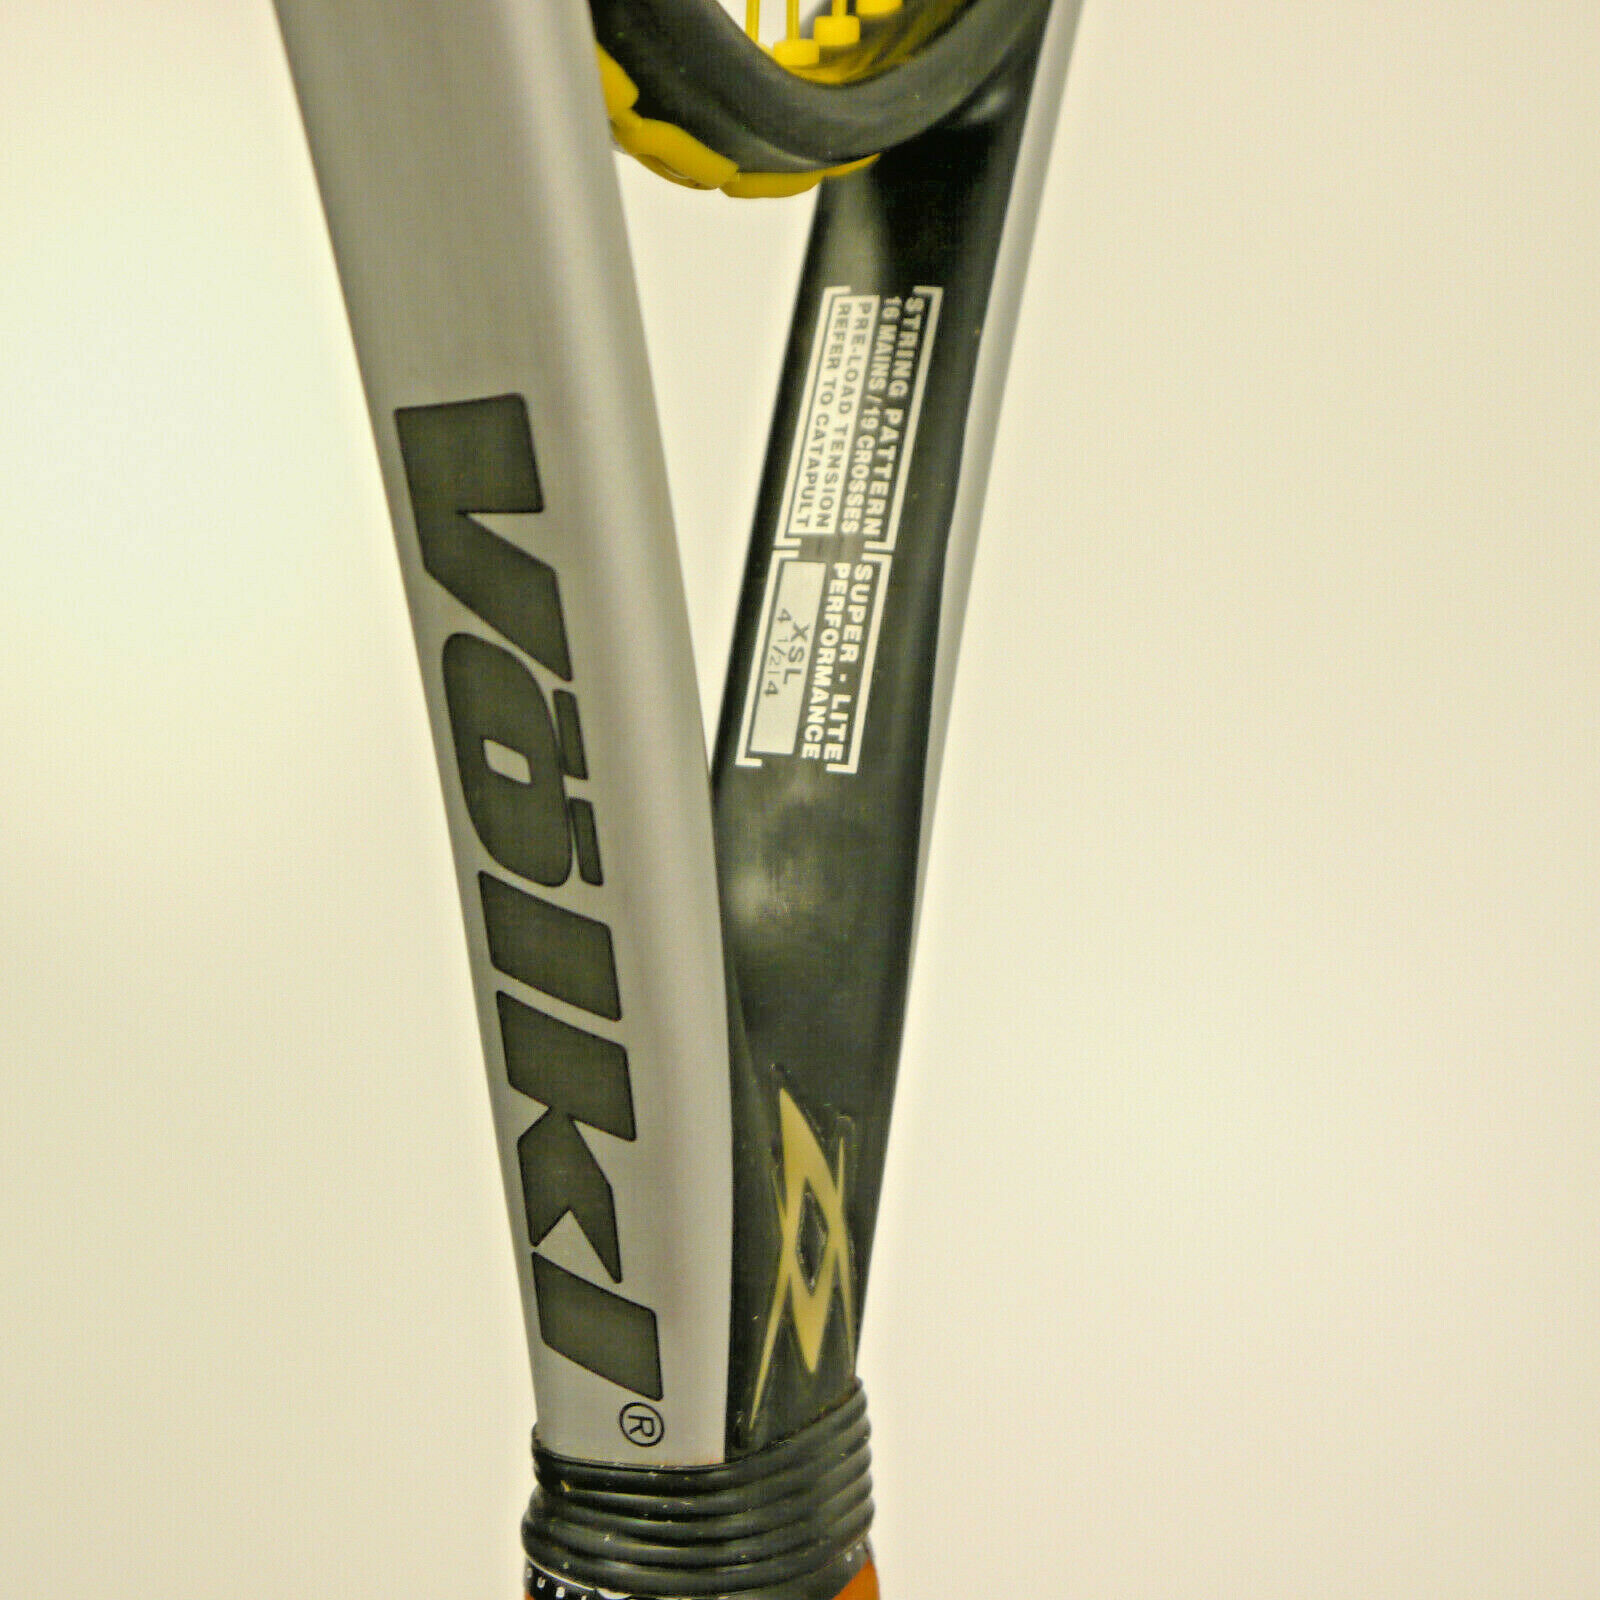 Volkl Quantum catapulta 3 tenis raqueta Sq 110 en 4.5  de agarre con cubierta